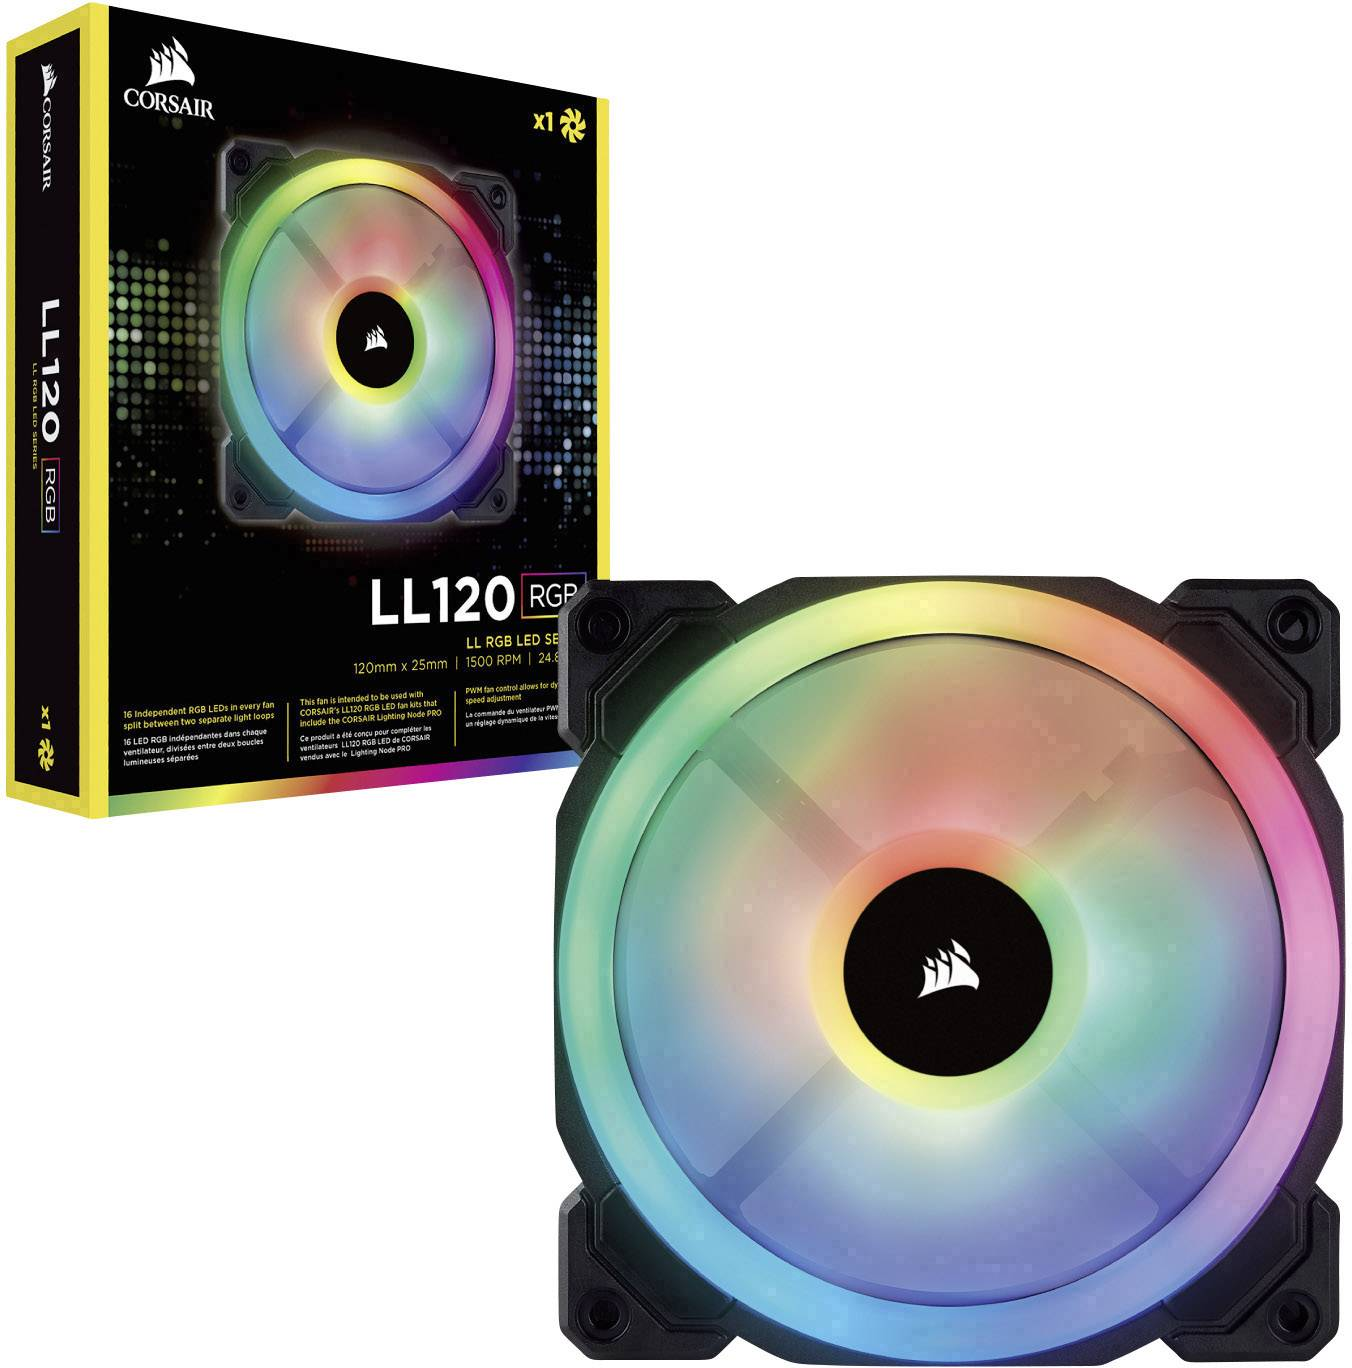 Corsair LL120 RGB Dual Light Loop PC fan Black, RGB (W x H x